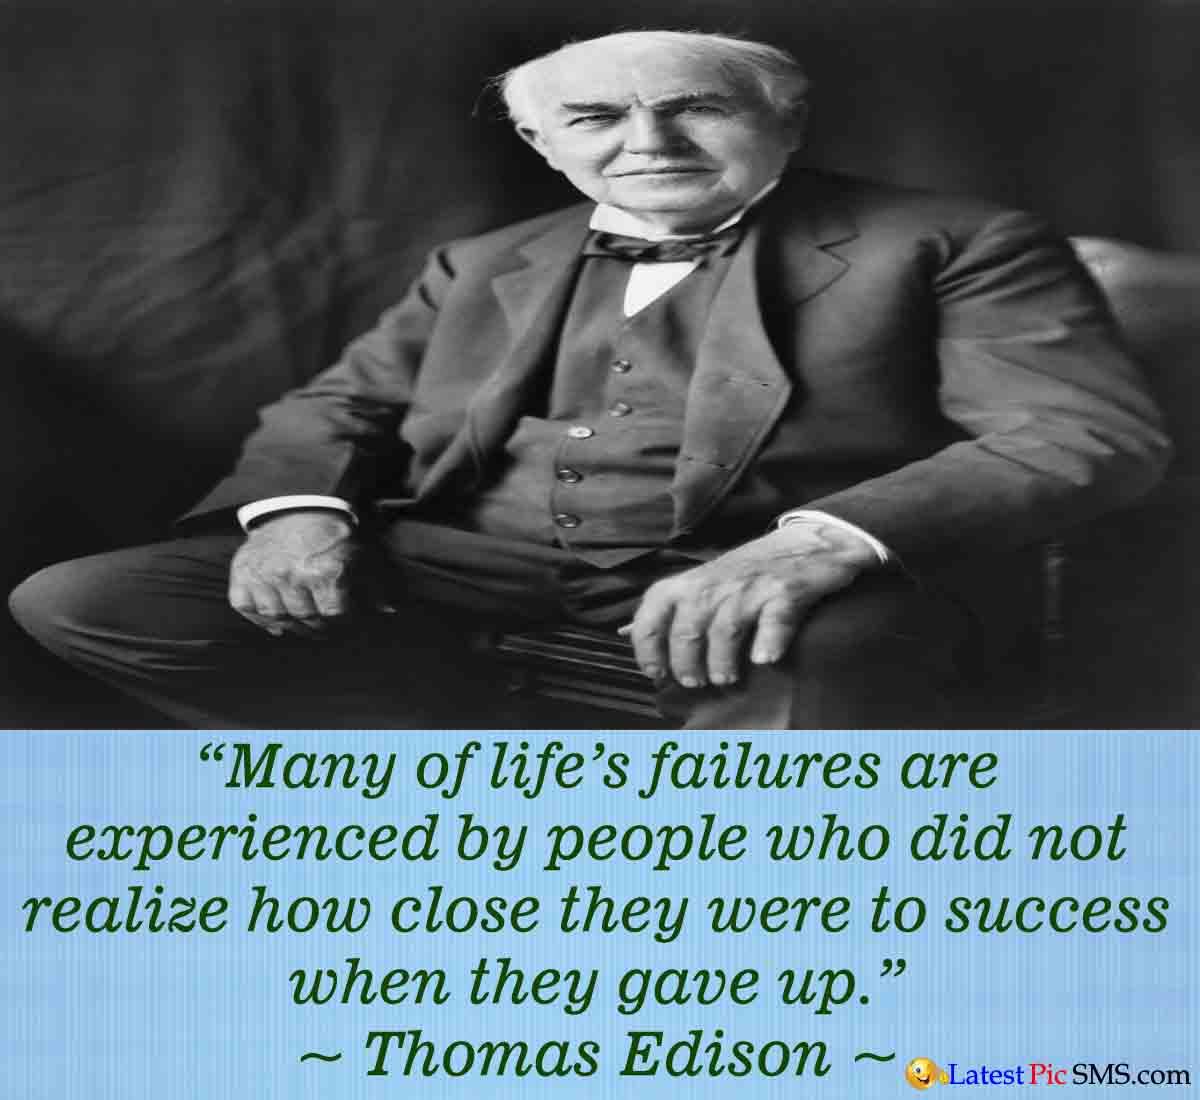 Thomas Edison Life Quote